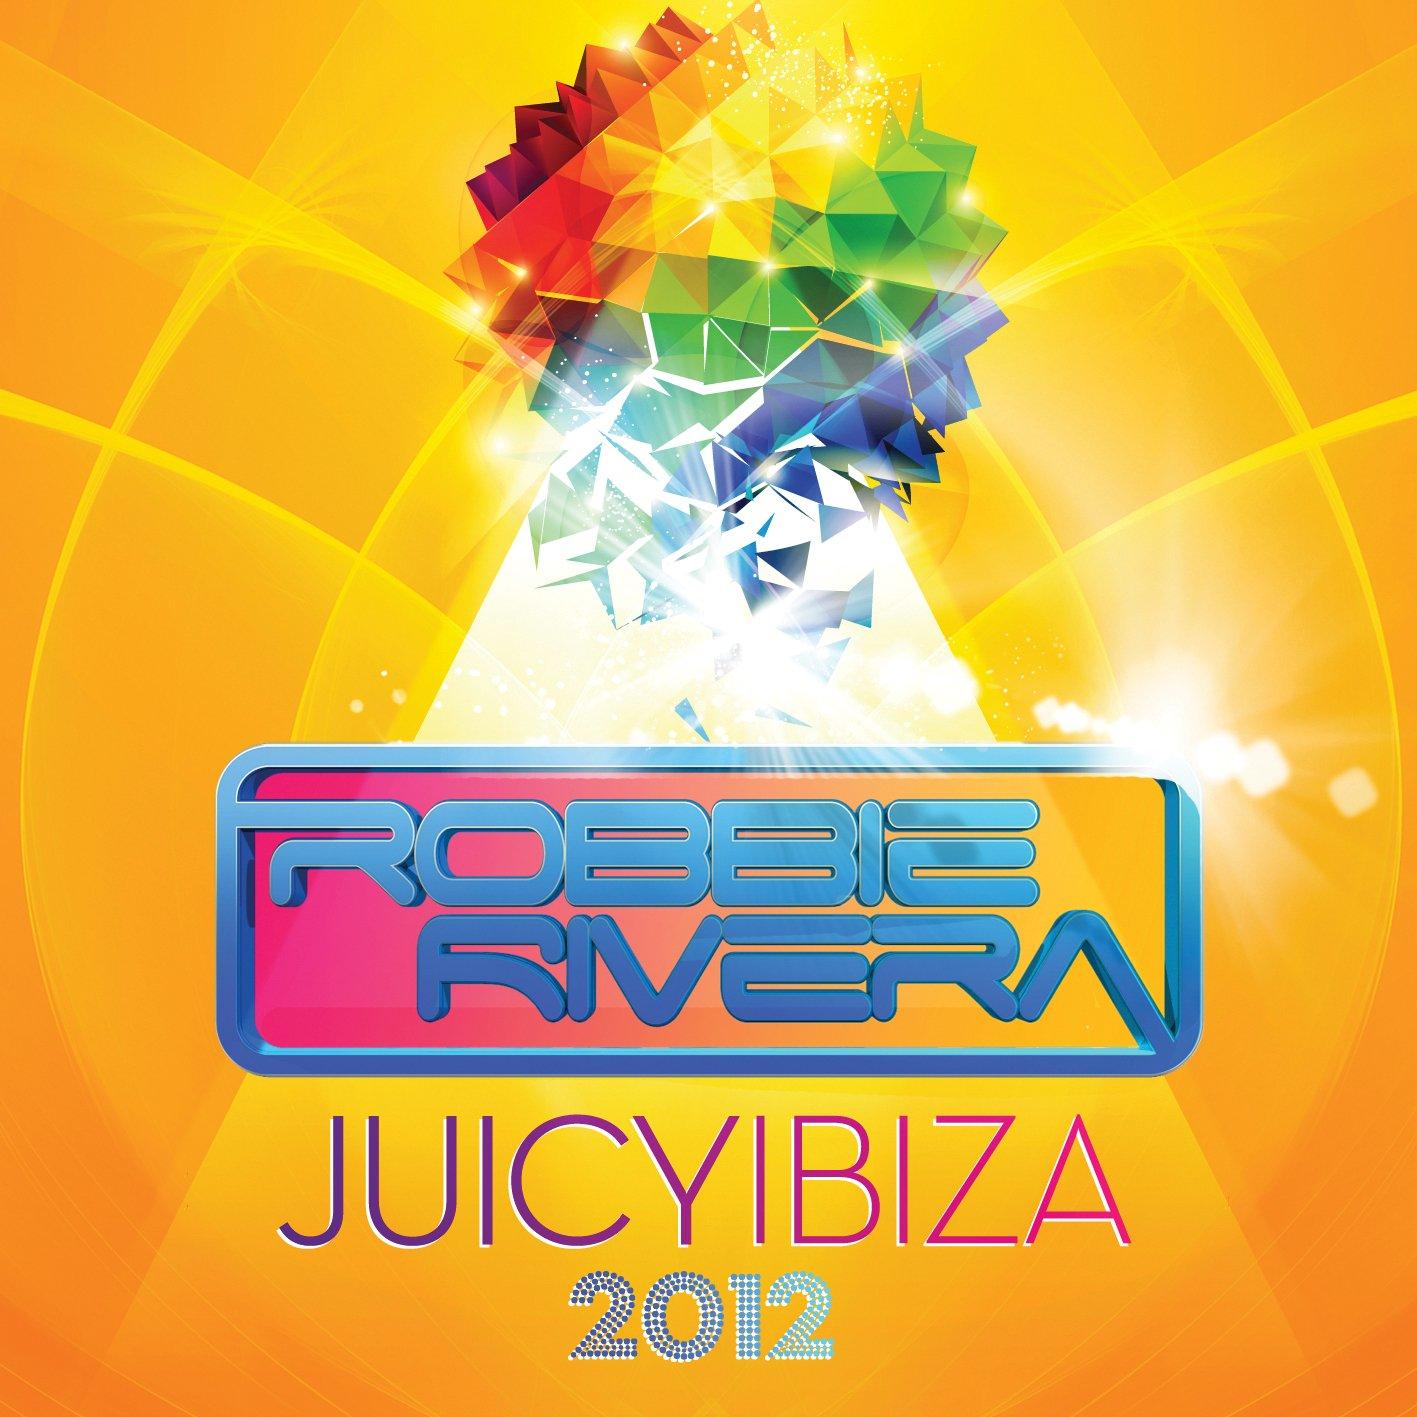 Robbie Rivera - Juicy Ibiza 2012 (2PC)